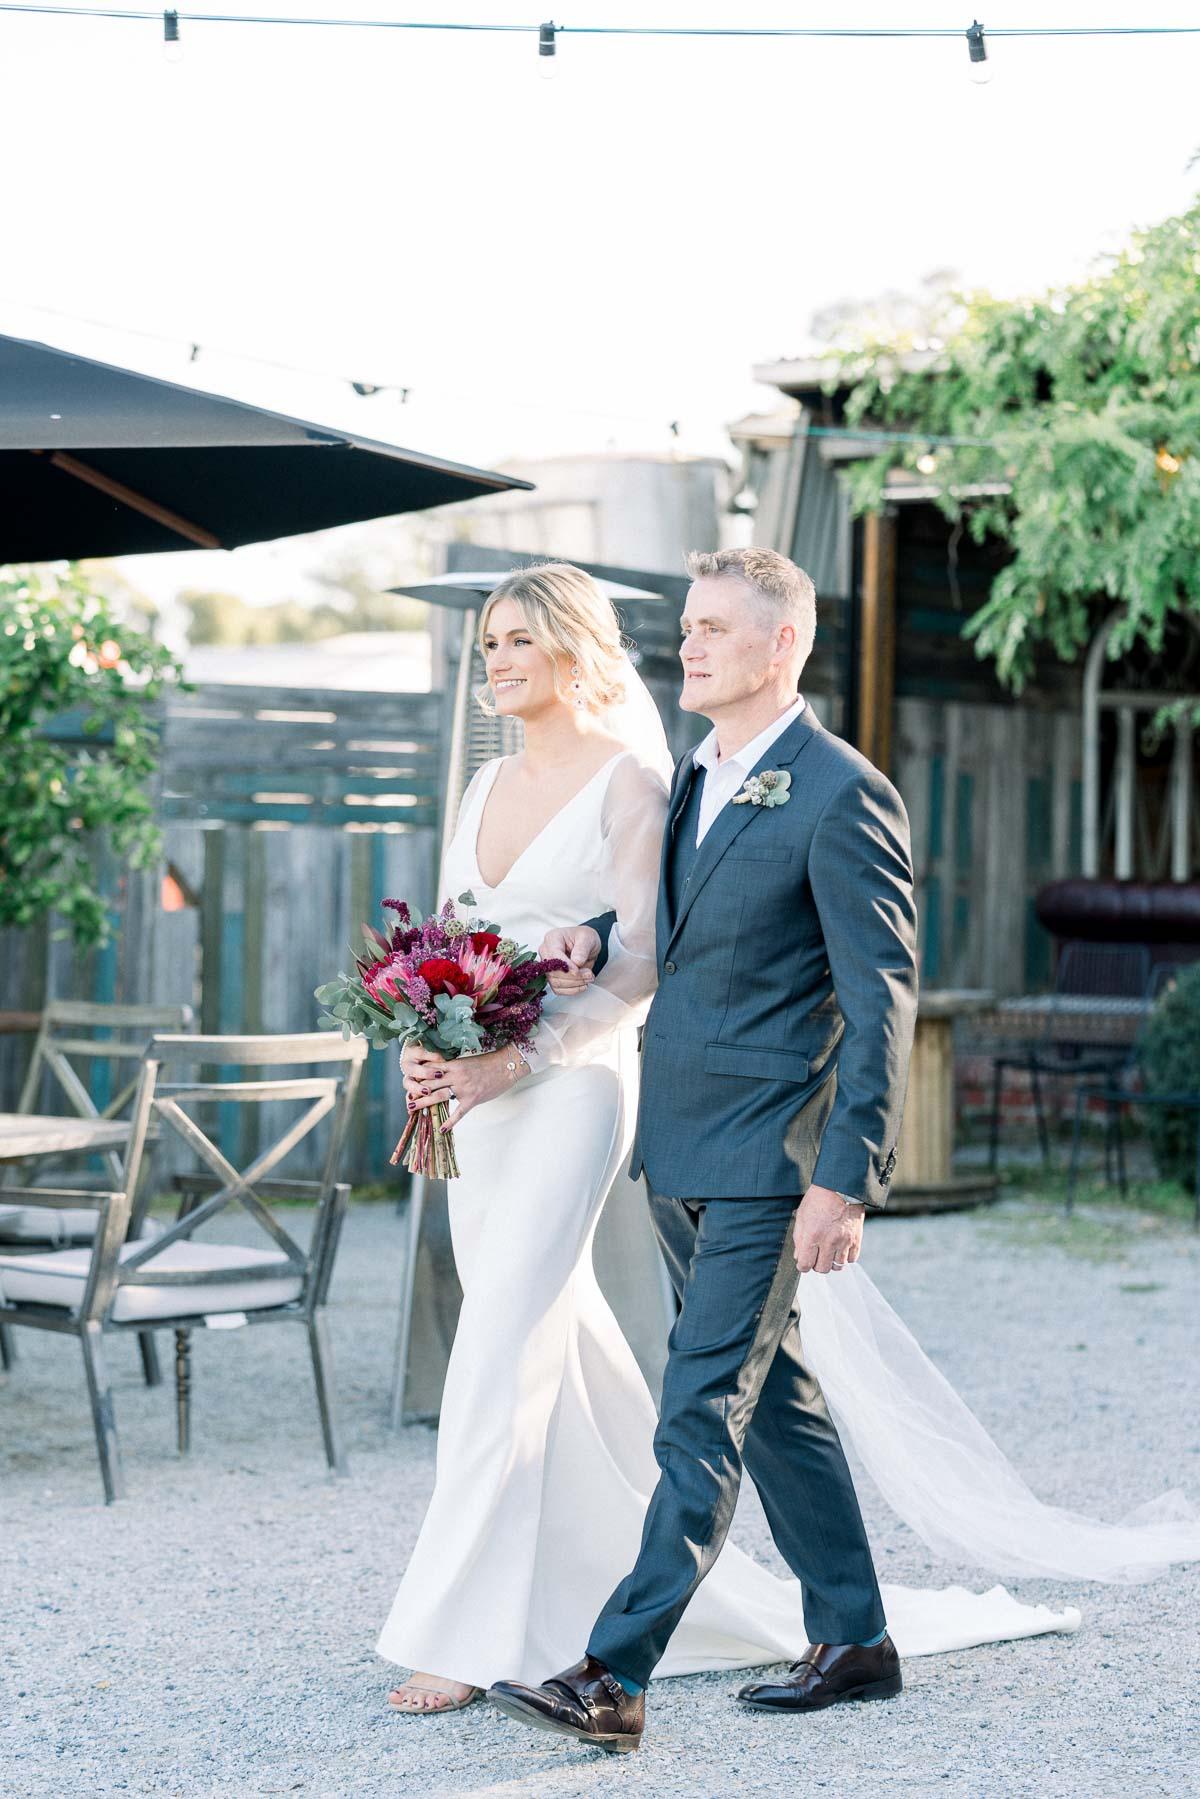 rustic-yarra-valley-wedding-venue-acacia-ridge-georgia-james-08017.jpg